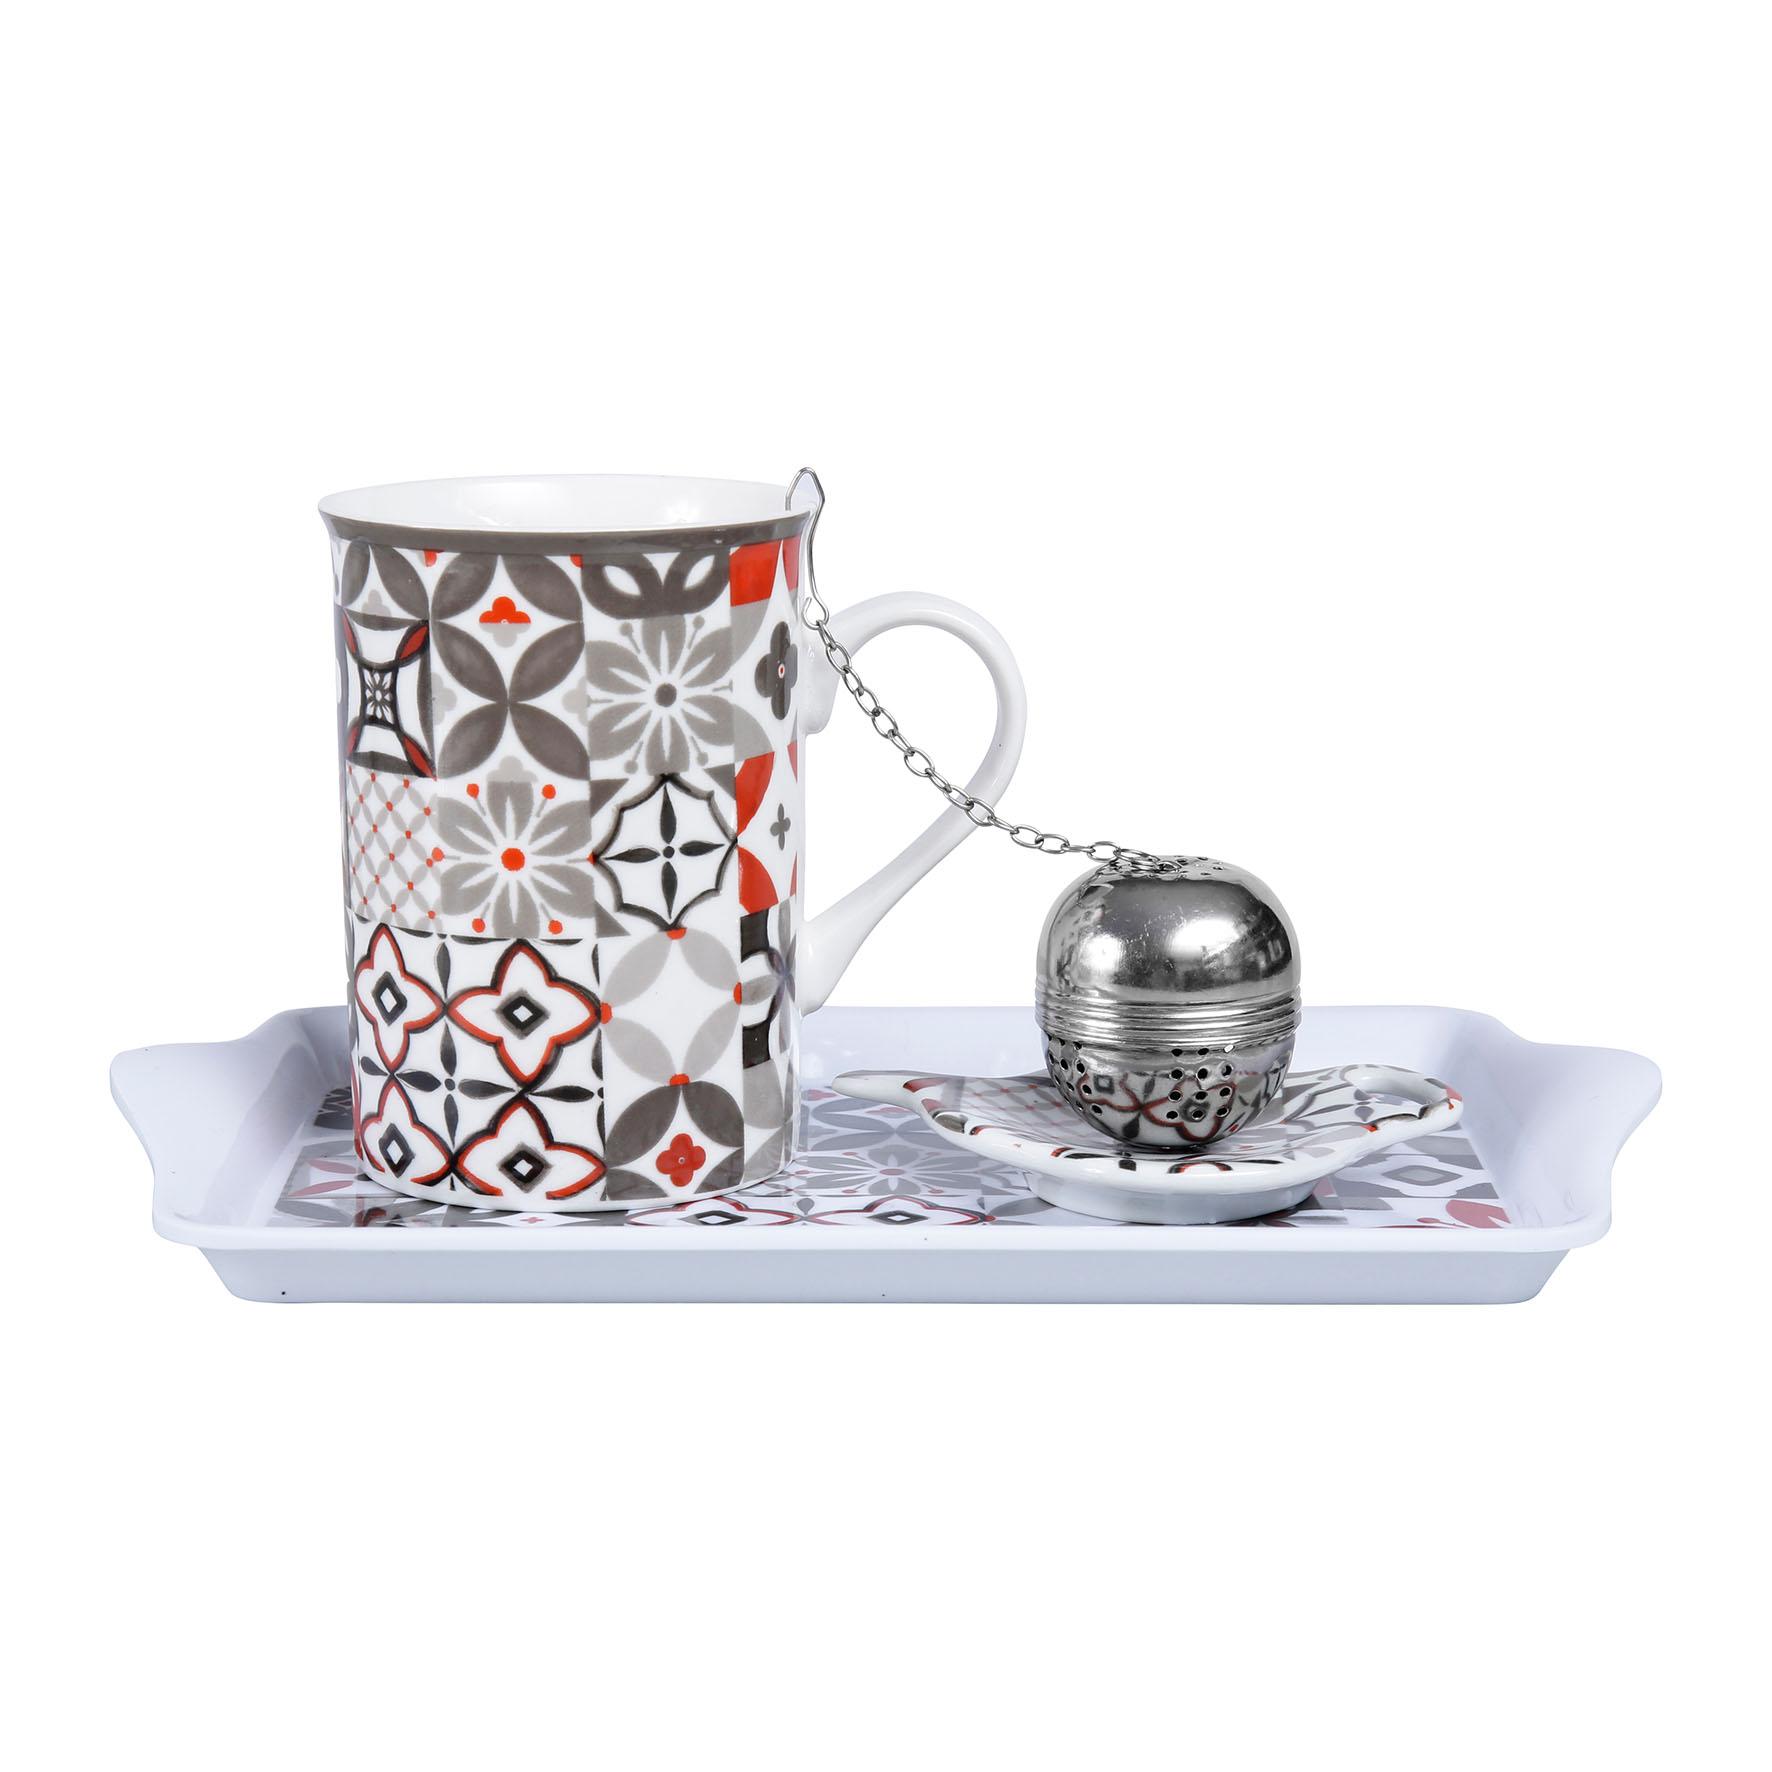 Set pentru ceai - The Carreau Rge thumbnail